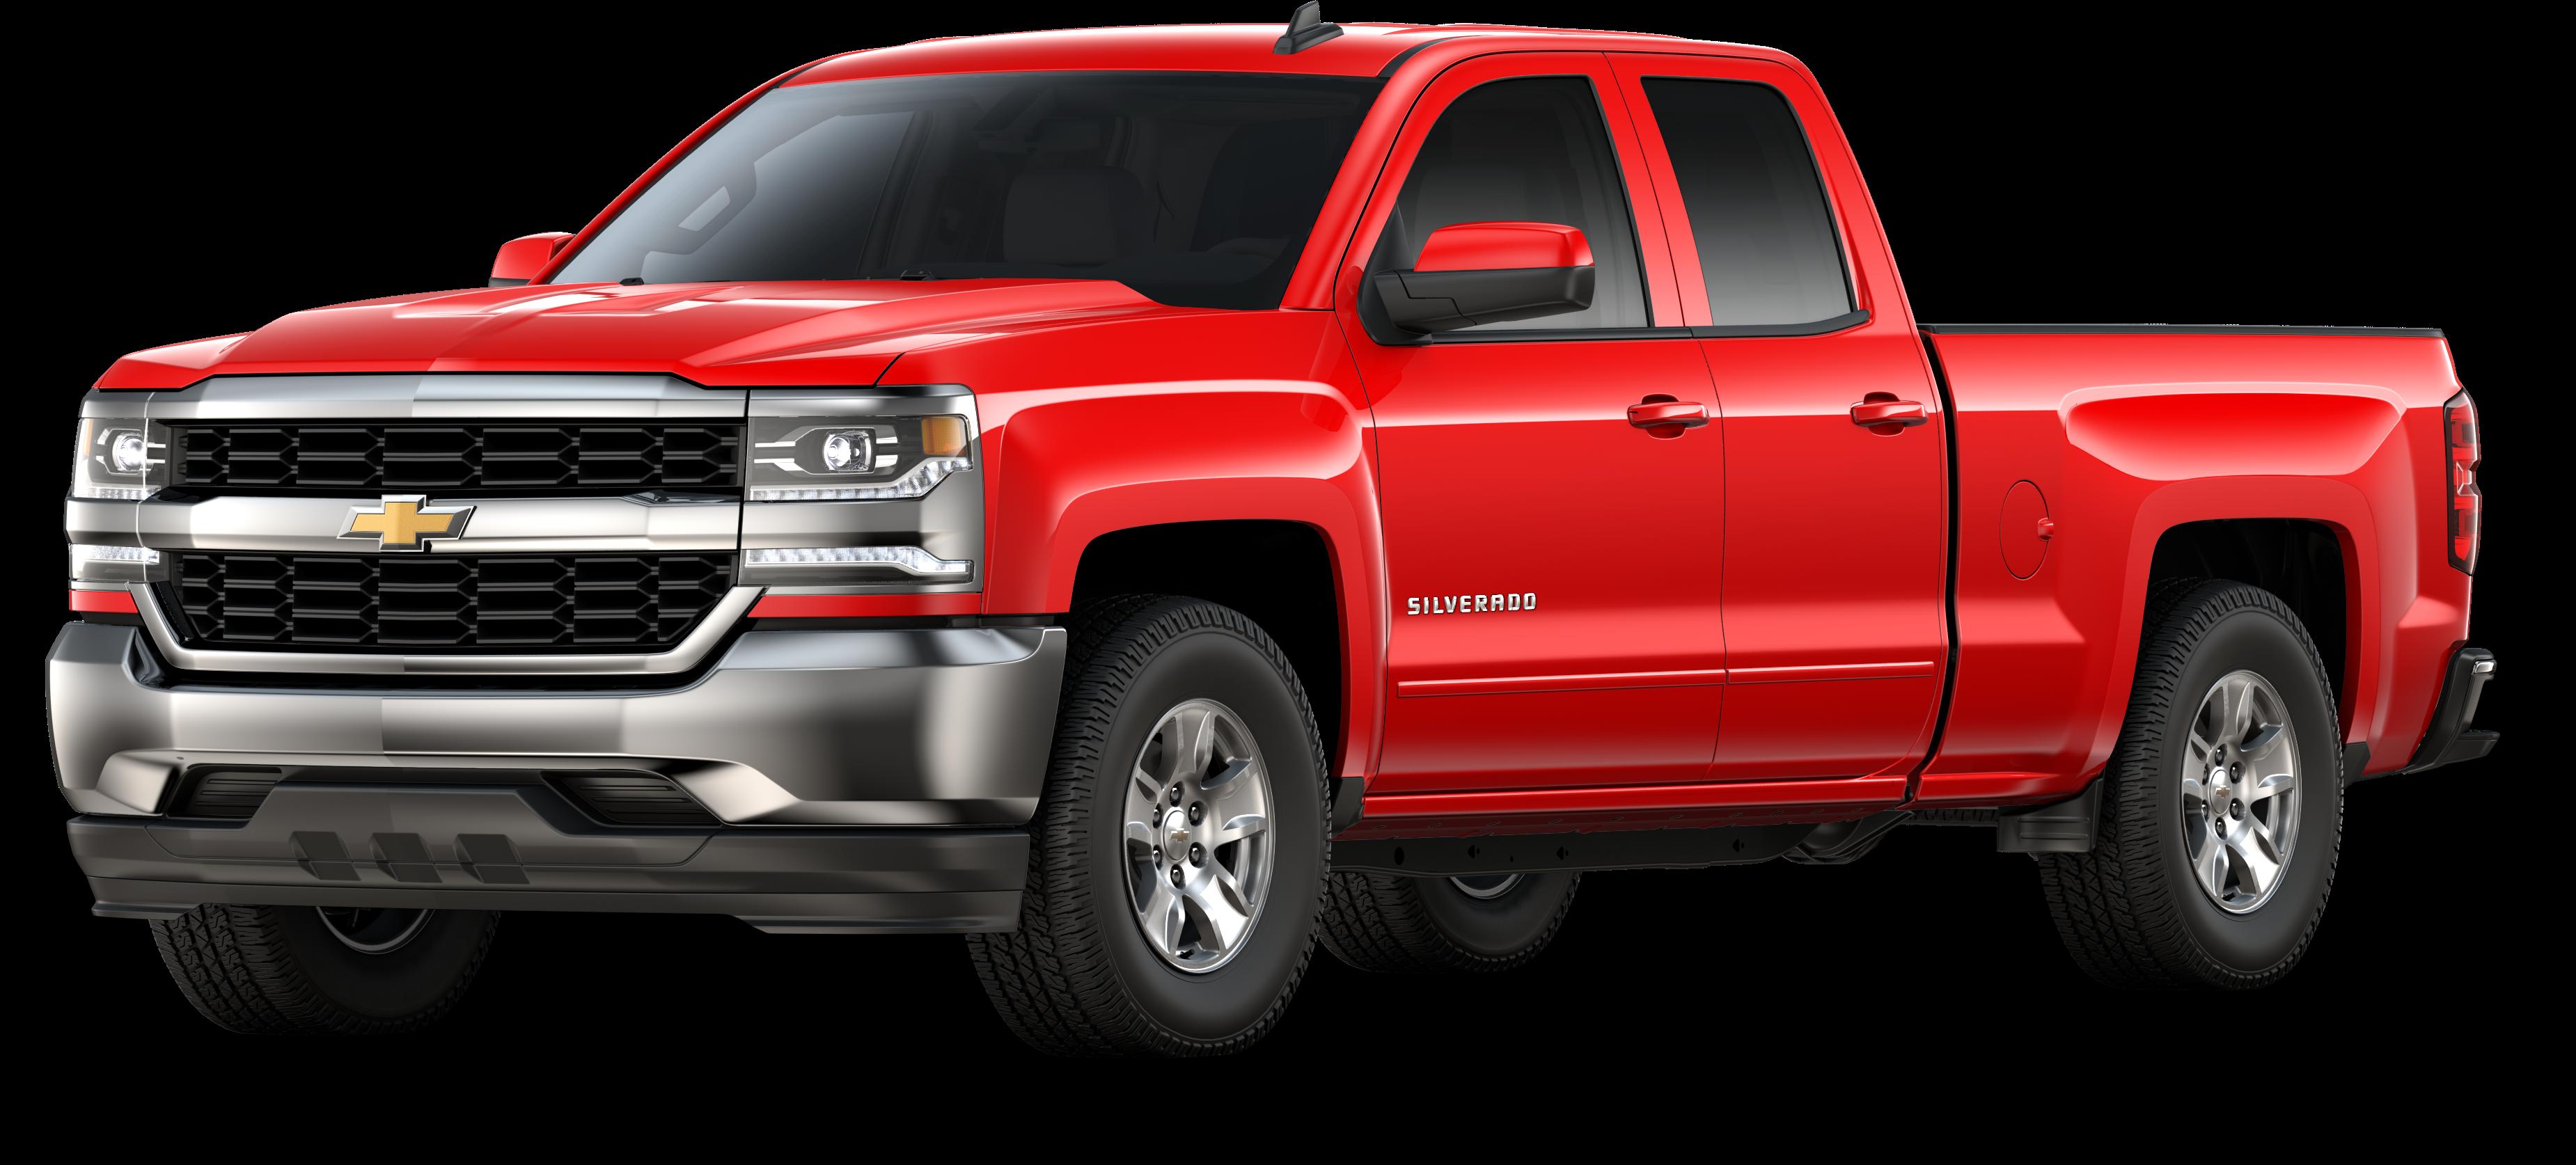 Buy A 2017 Chevy Silverado 1500 Chevrolet Sales Near